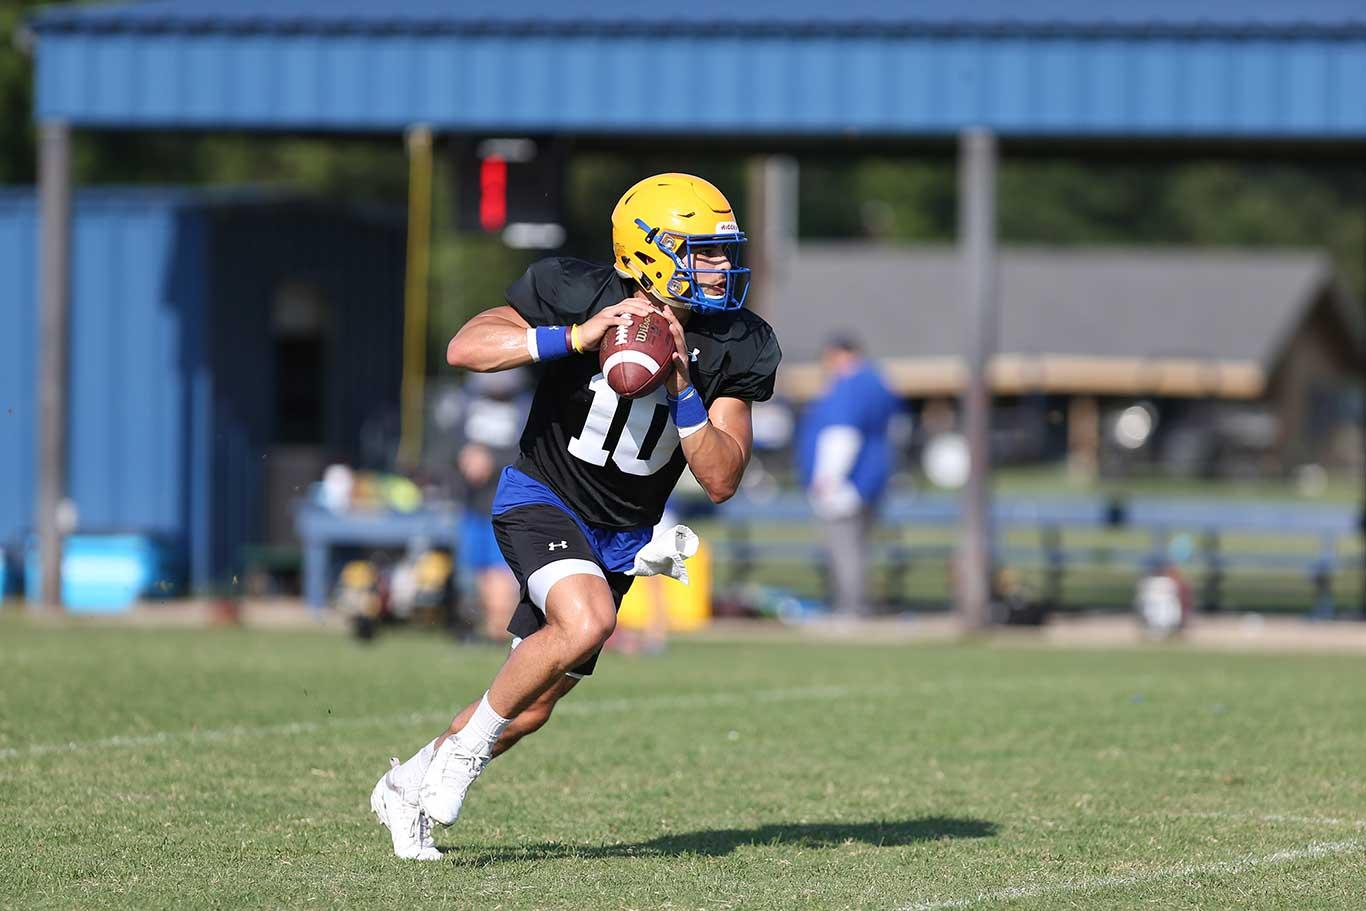 Football player prepares to throw ball